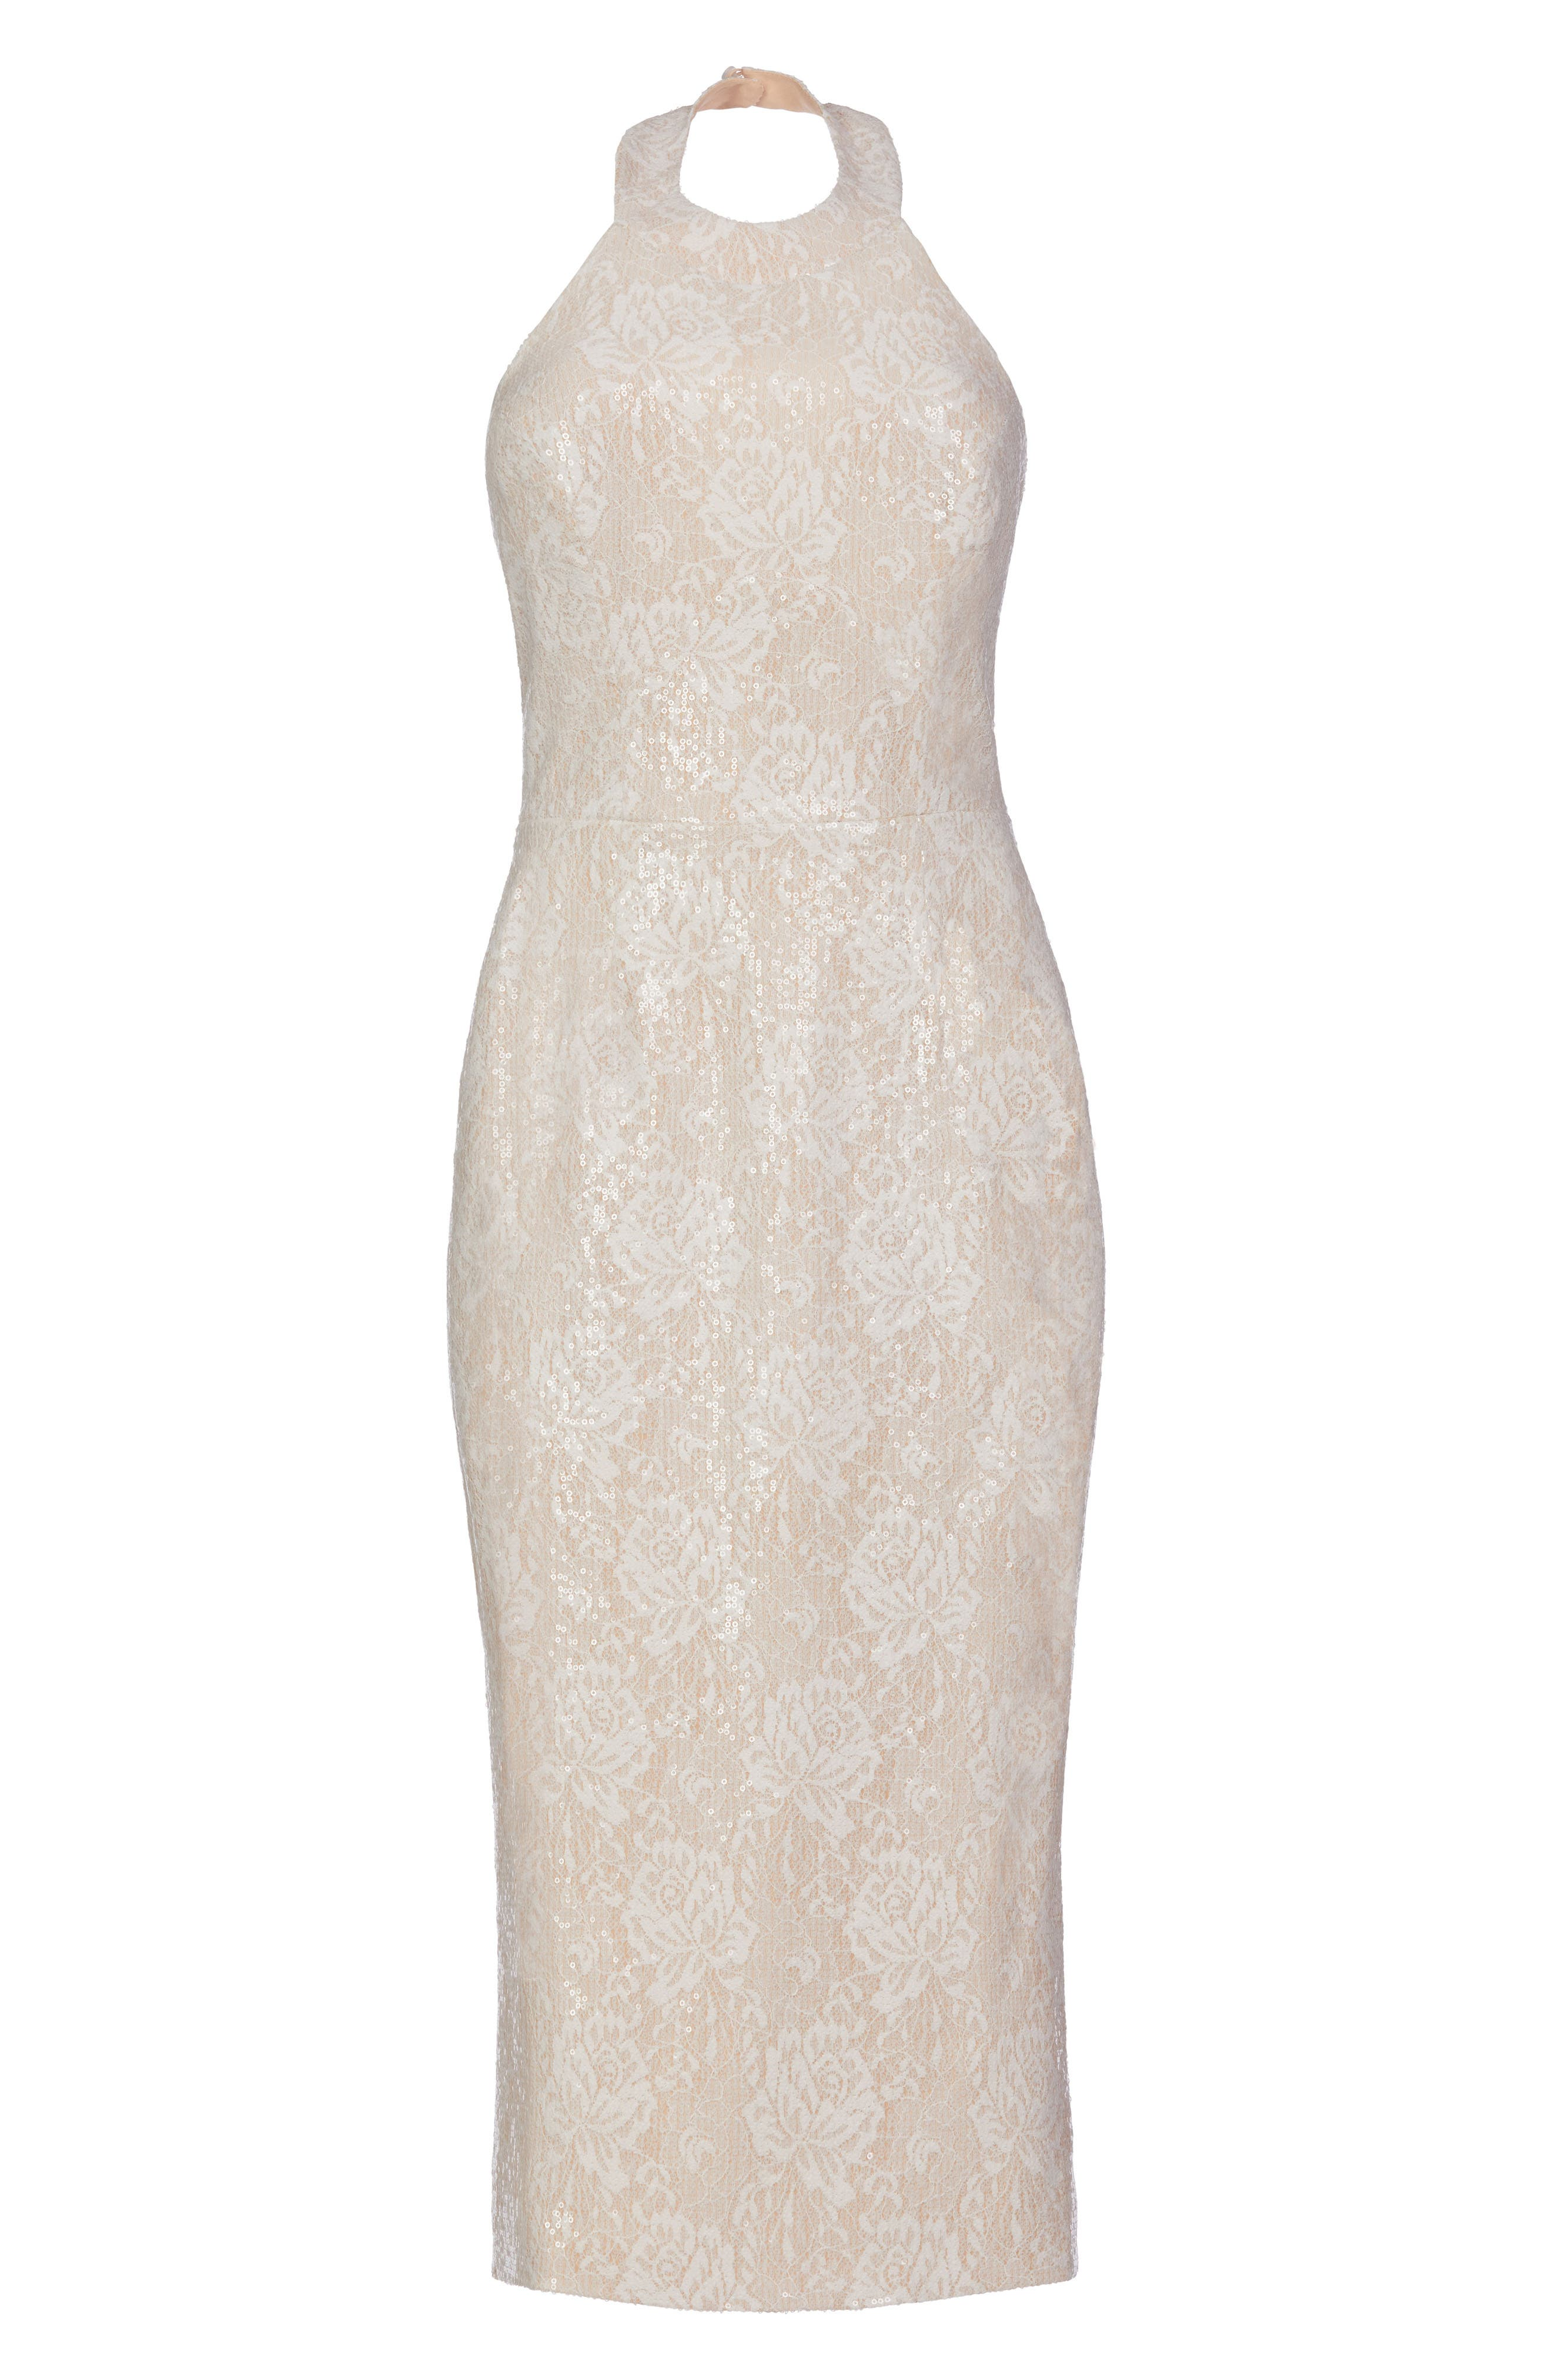 Cassie Halter Sequin Dress,                             Alternate thumbnail 4, color,                             154